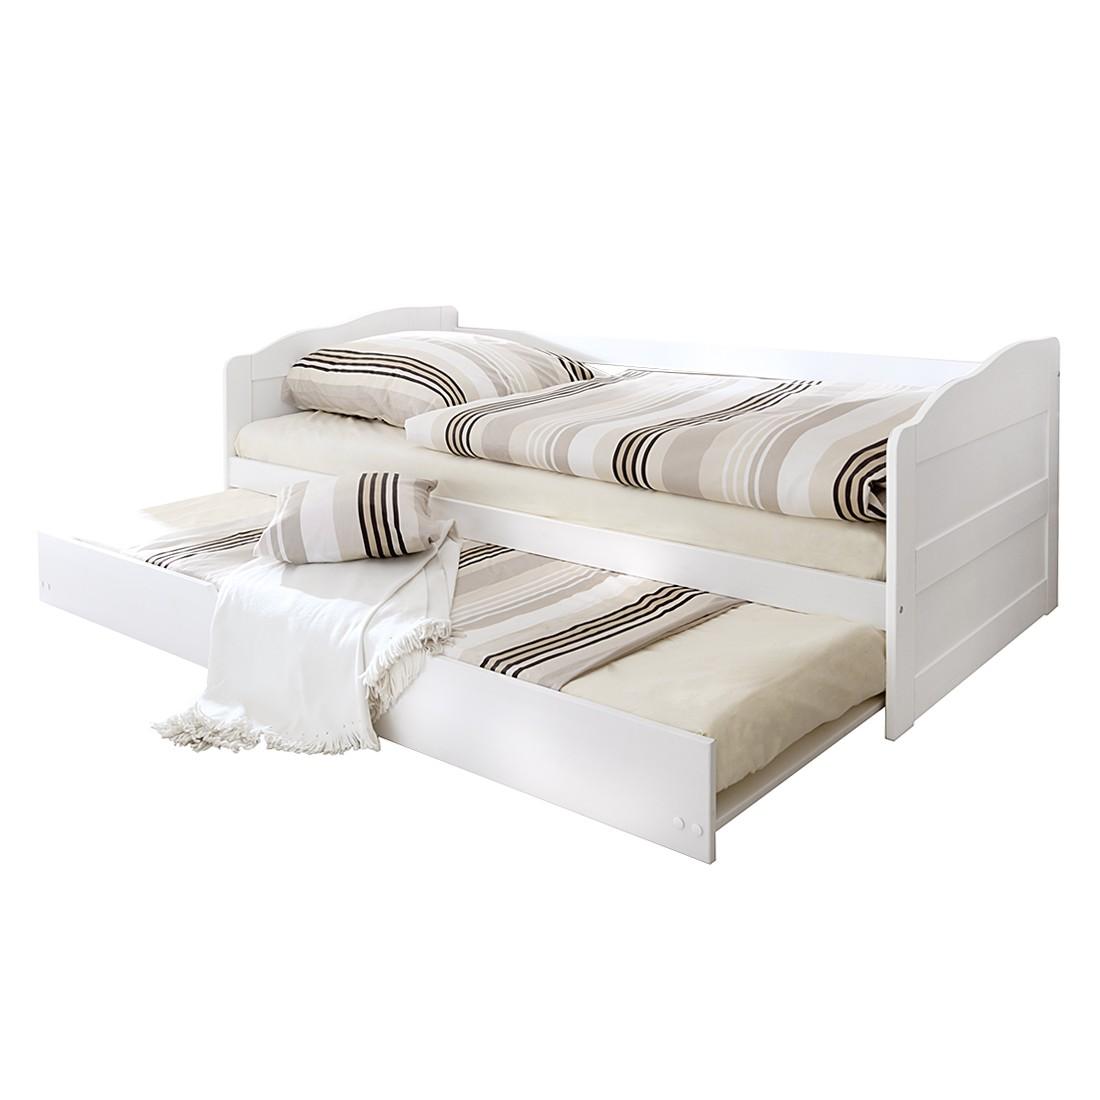 Sofabett Melinda - Kiefer massiv - Weiß, Ticaa